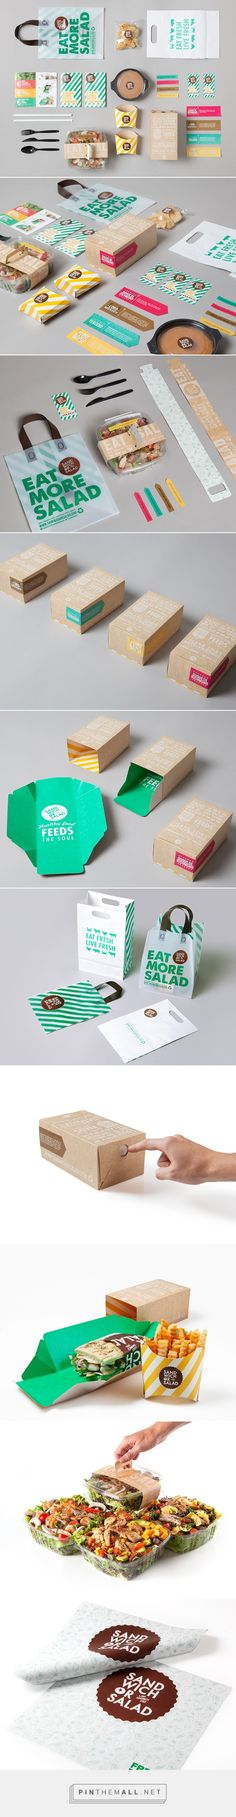 Sandwich or Salad on Behance - created via https://pinthemall.net